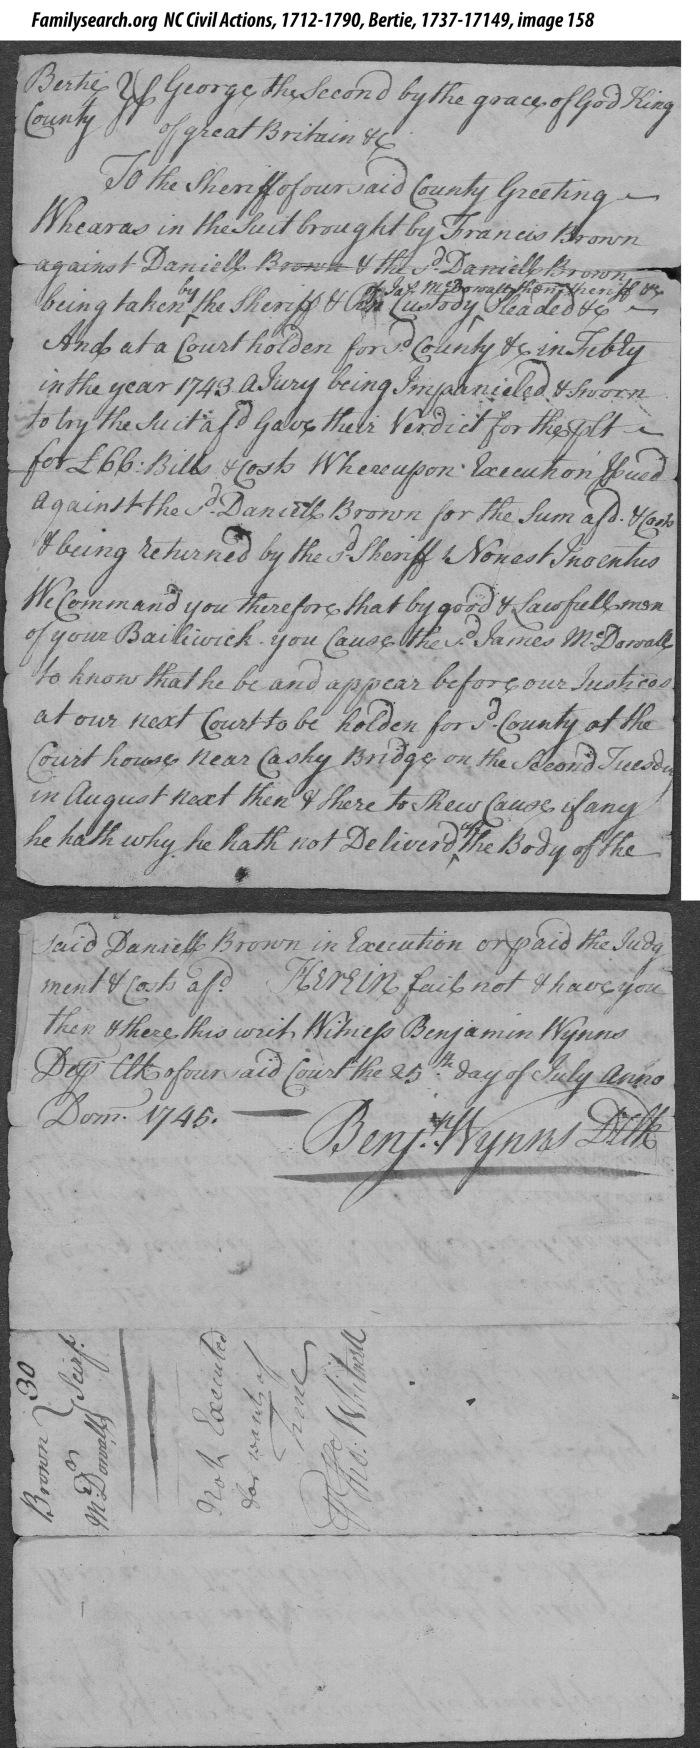 brown_Francis 1745